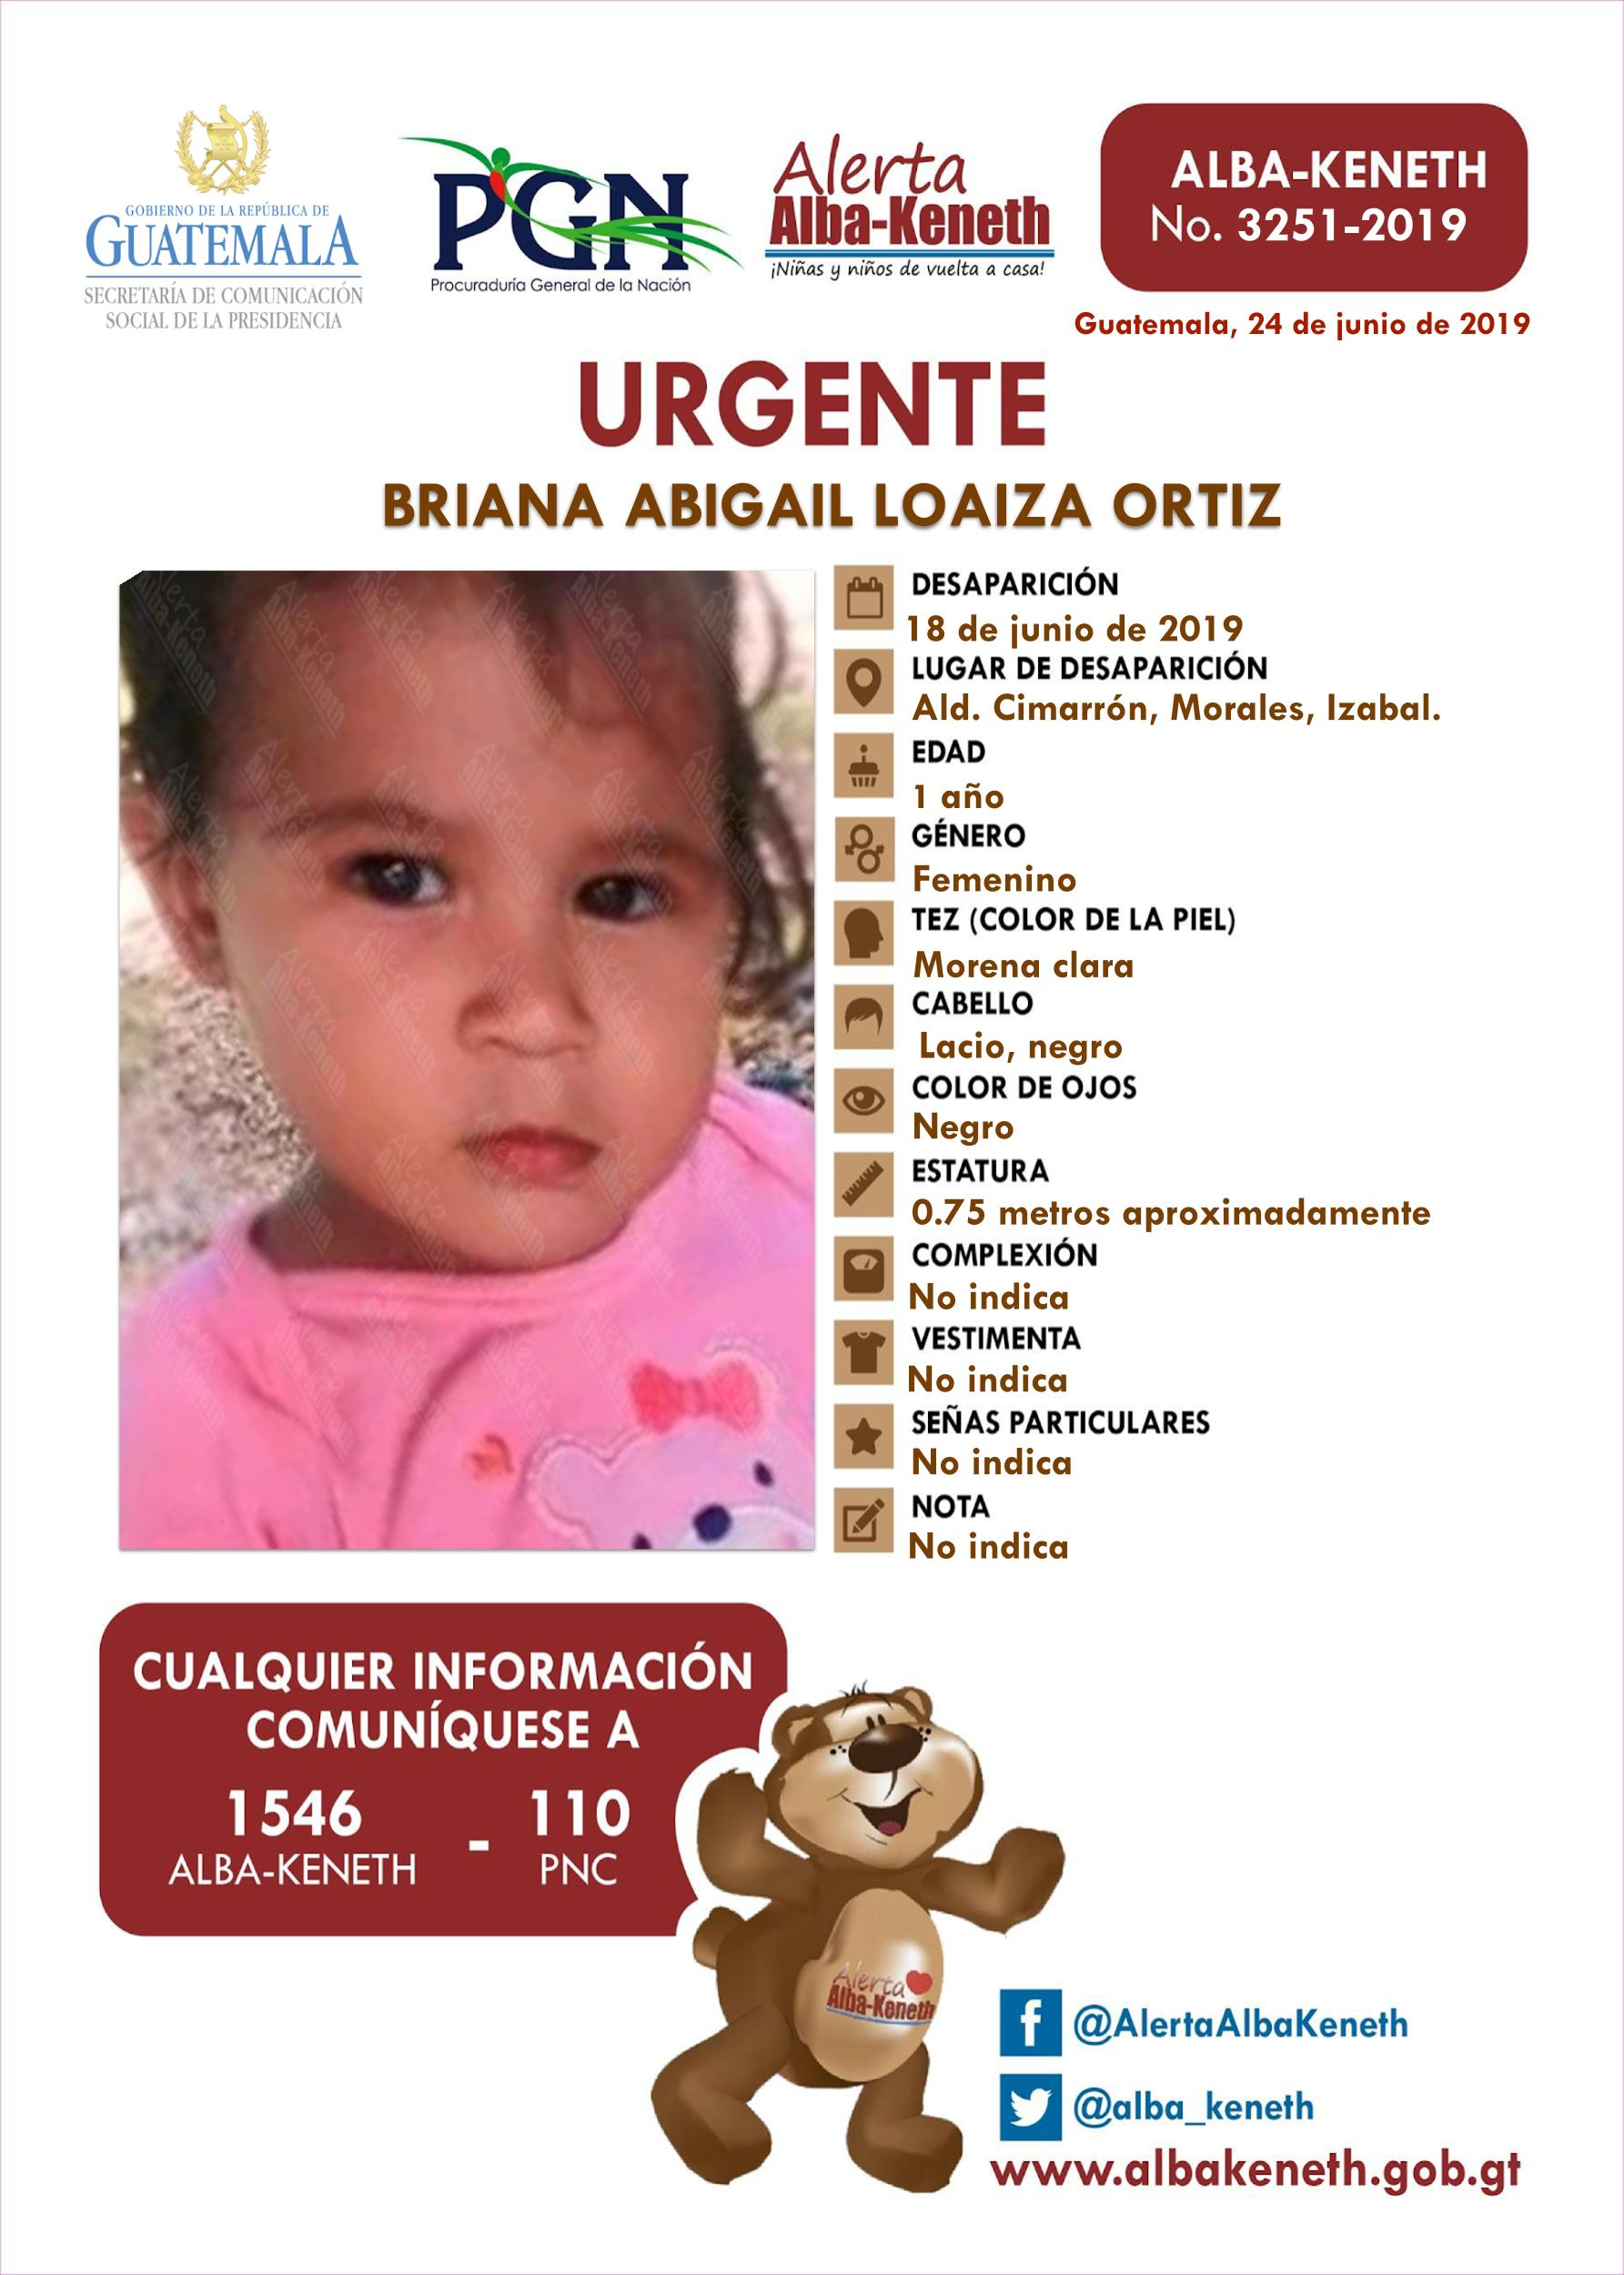 Briana Abigail Loaiza Ortiz